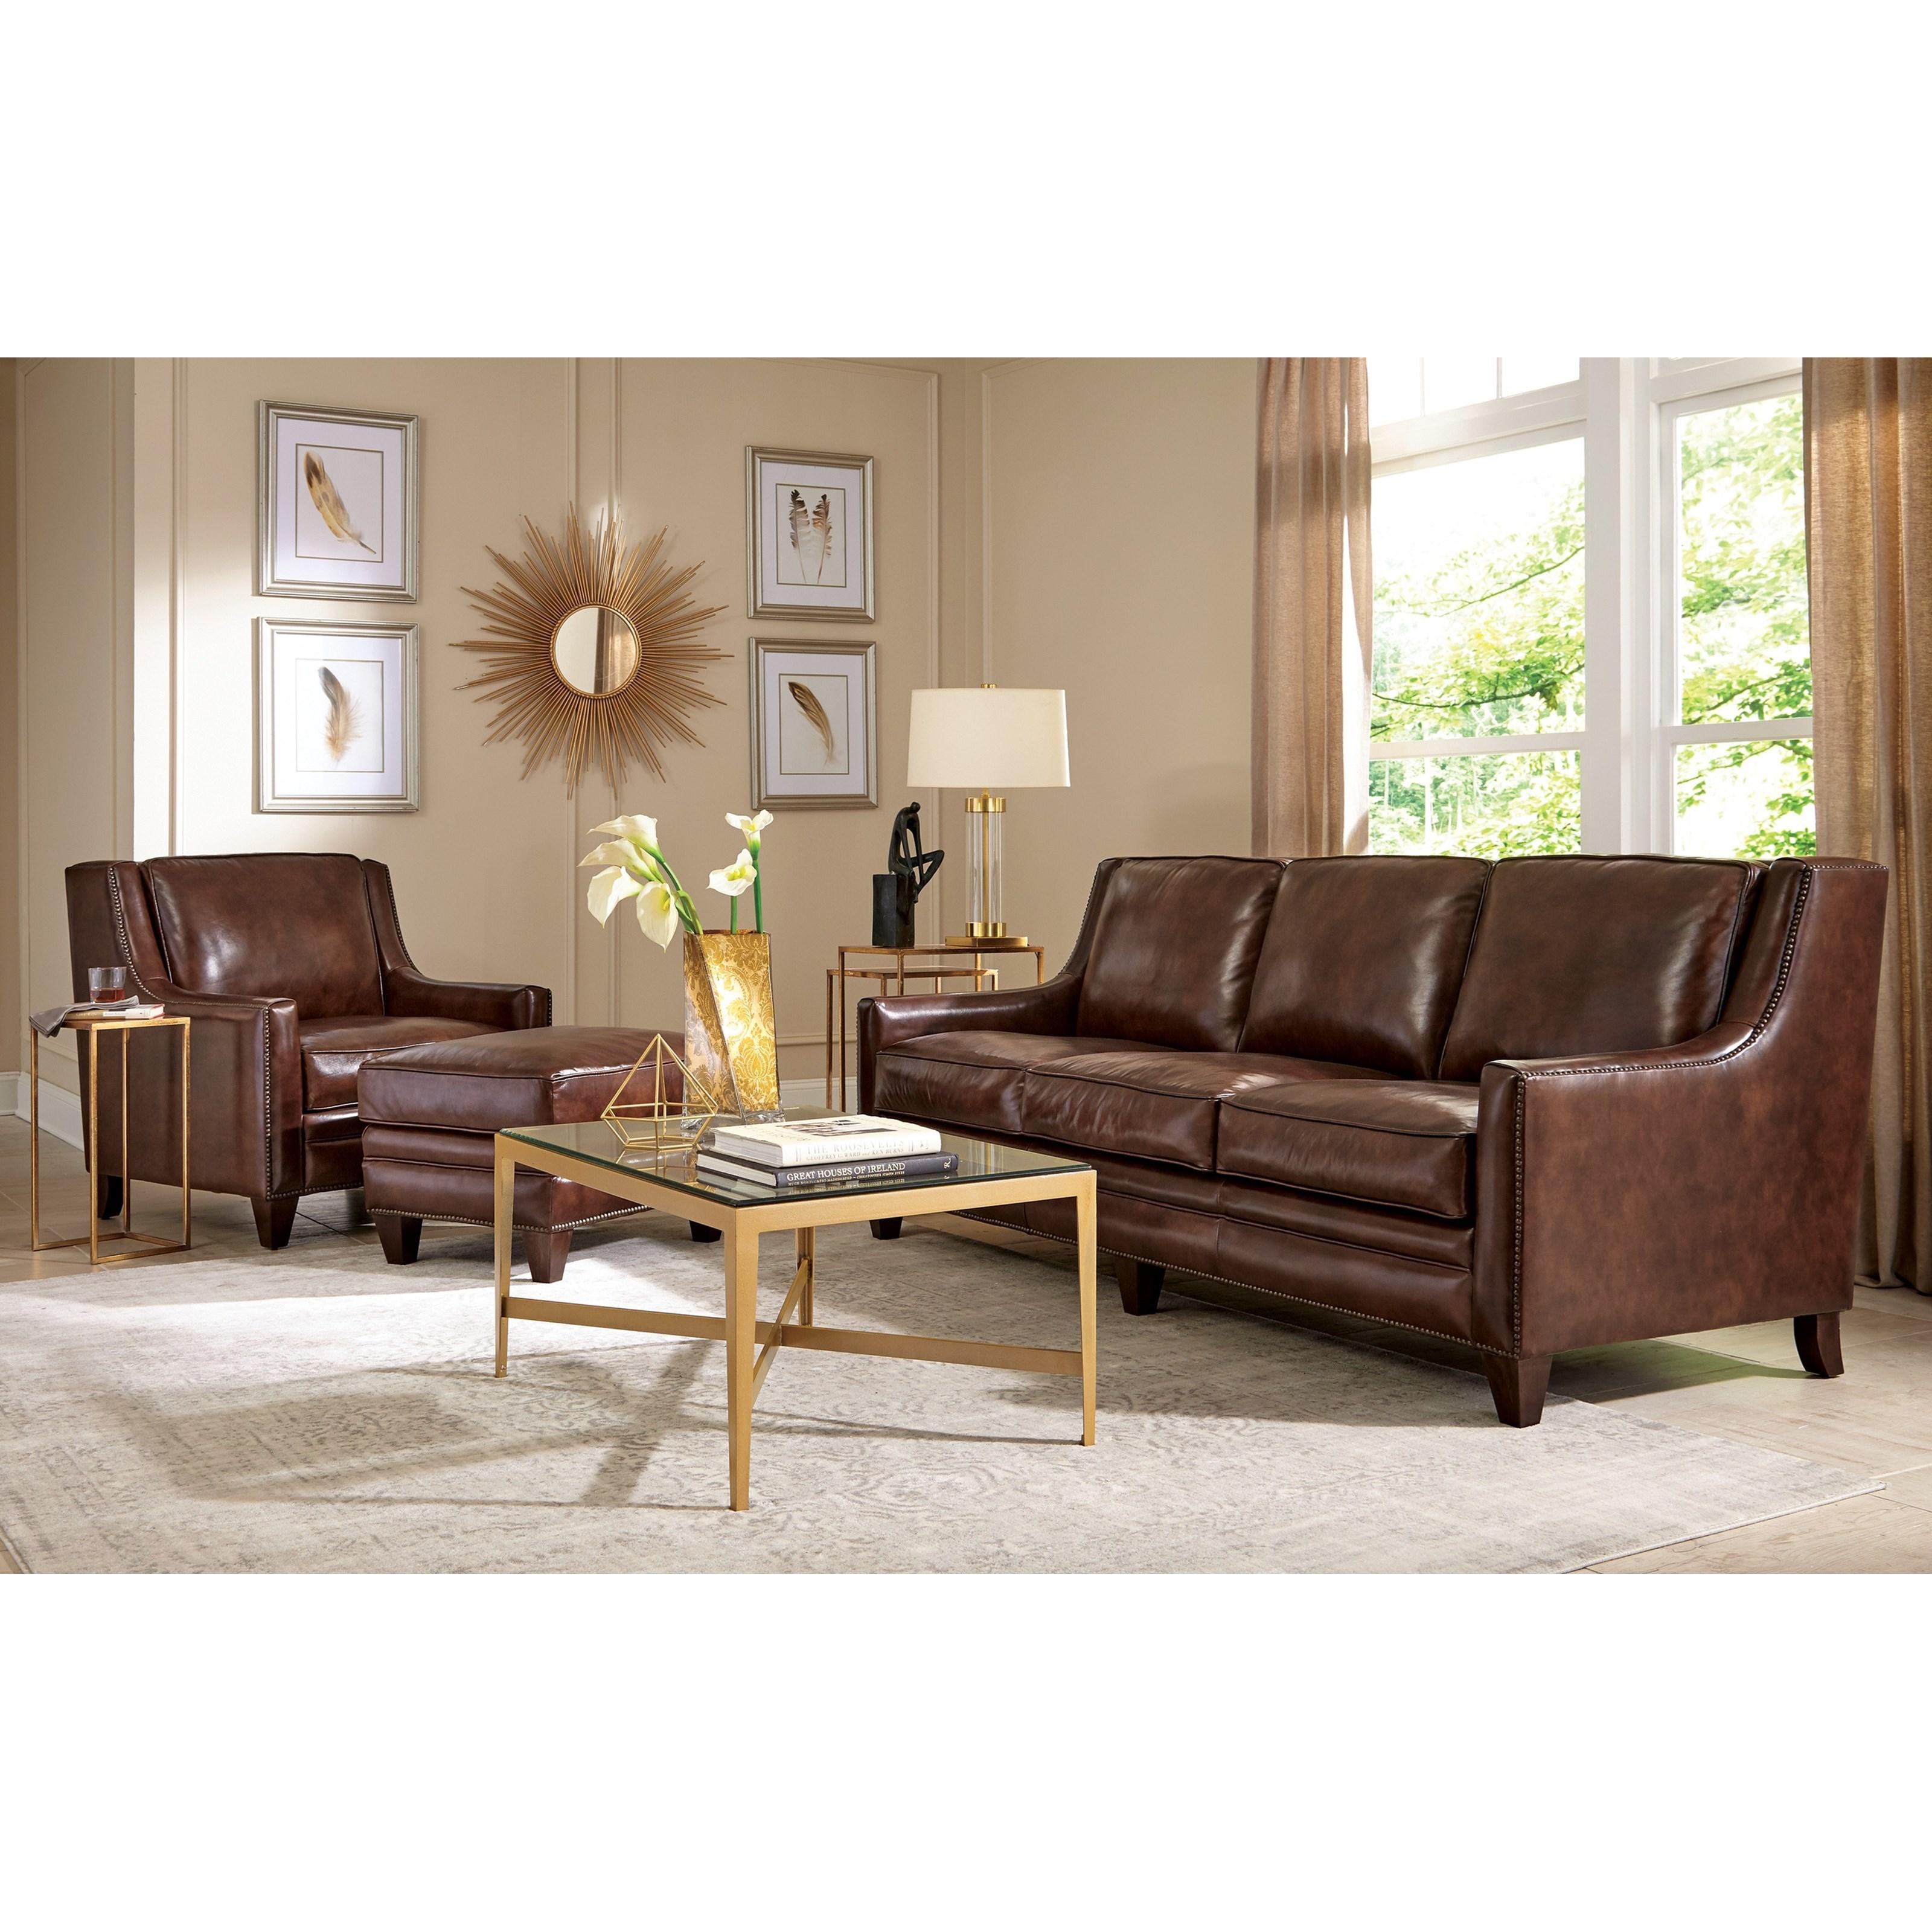 Craftmaster l162550 transitional nailhead studded sofa for Studded sofa sets